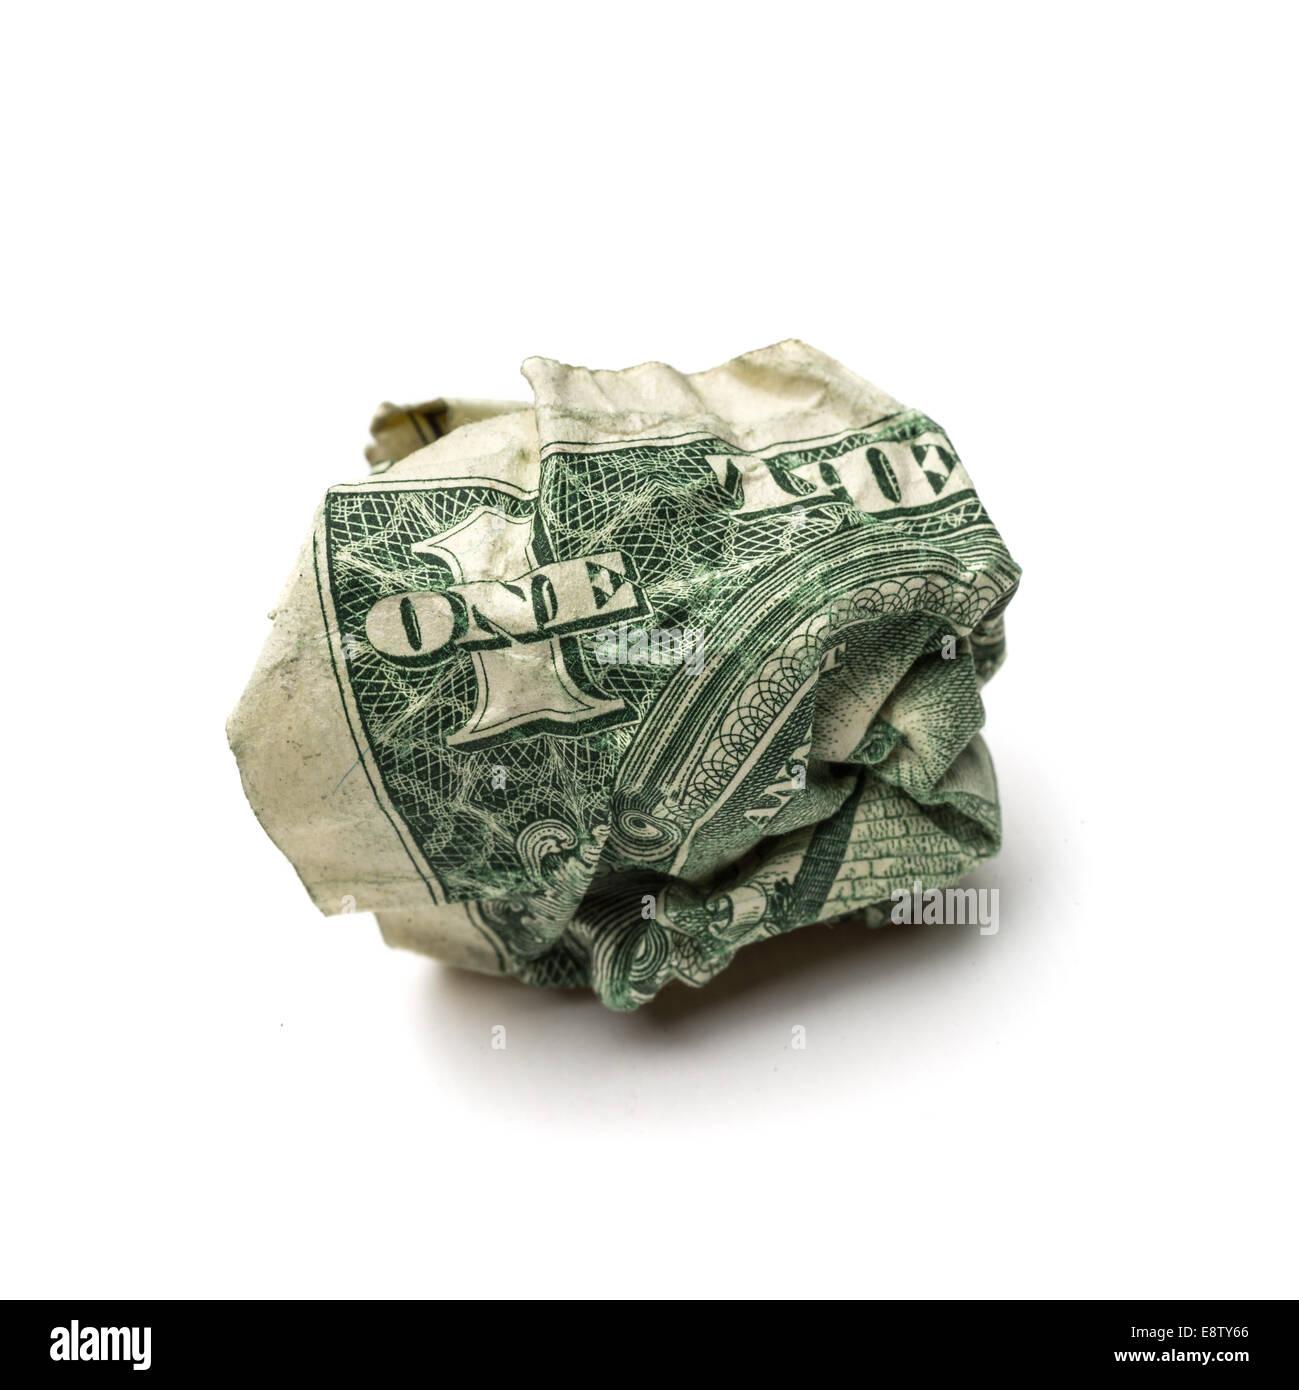 Crumpled dollar bills isolated on white background - Stock Image